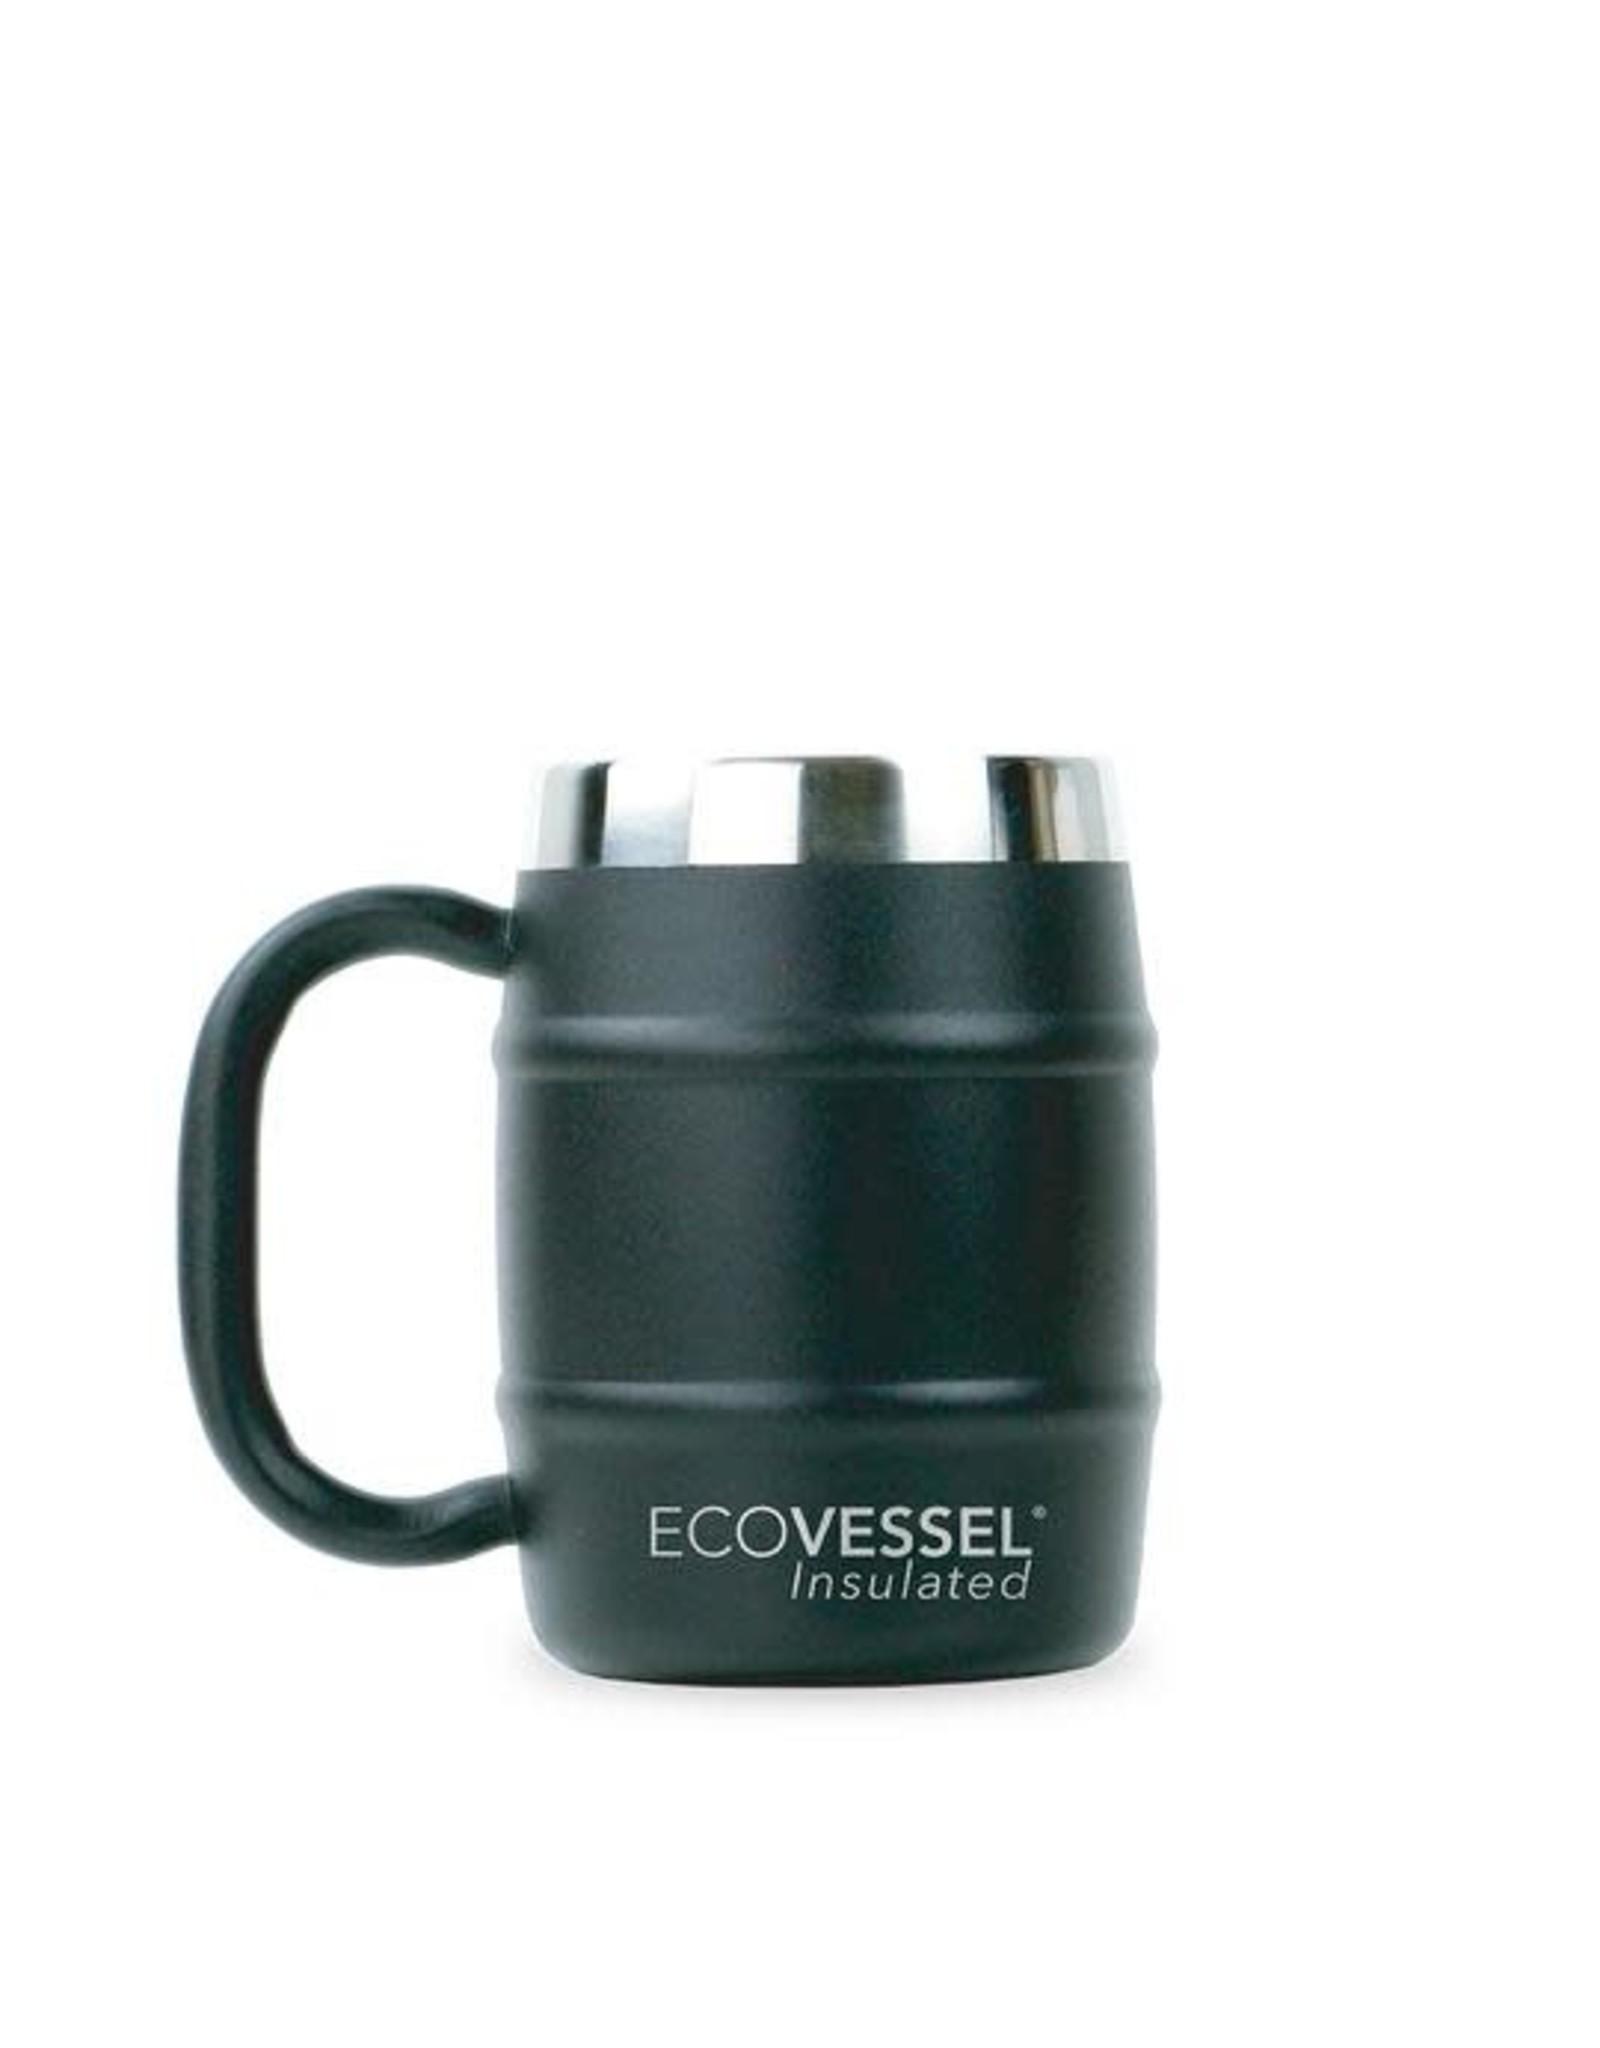 EcoVessel ECOVESSEL DOUBLE BARREL